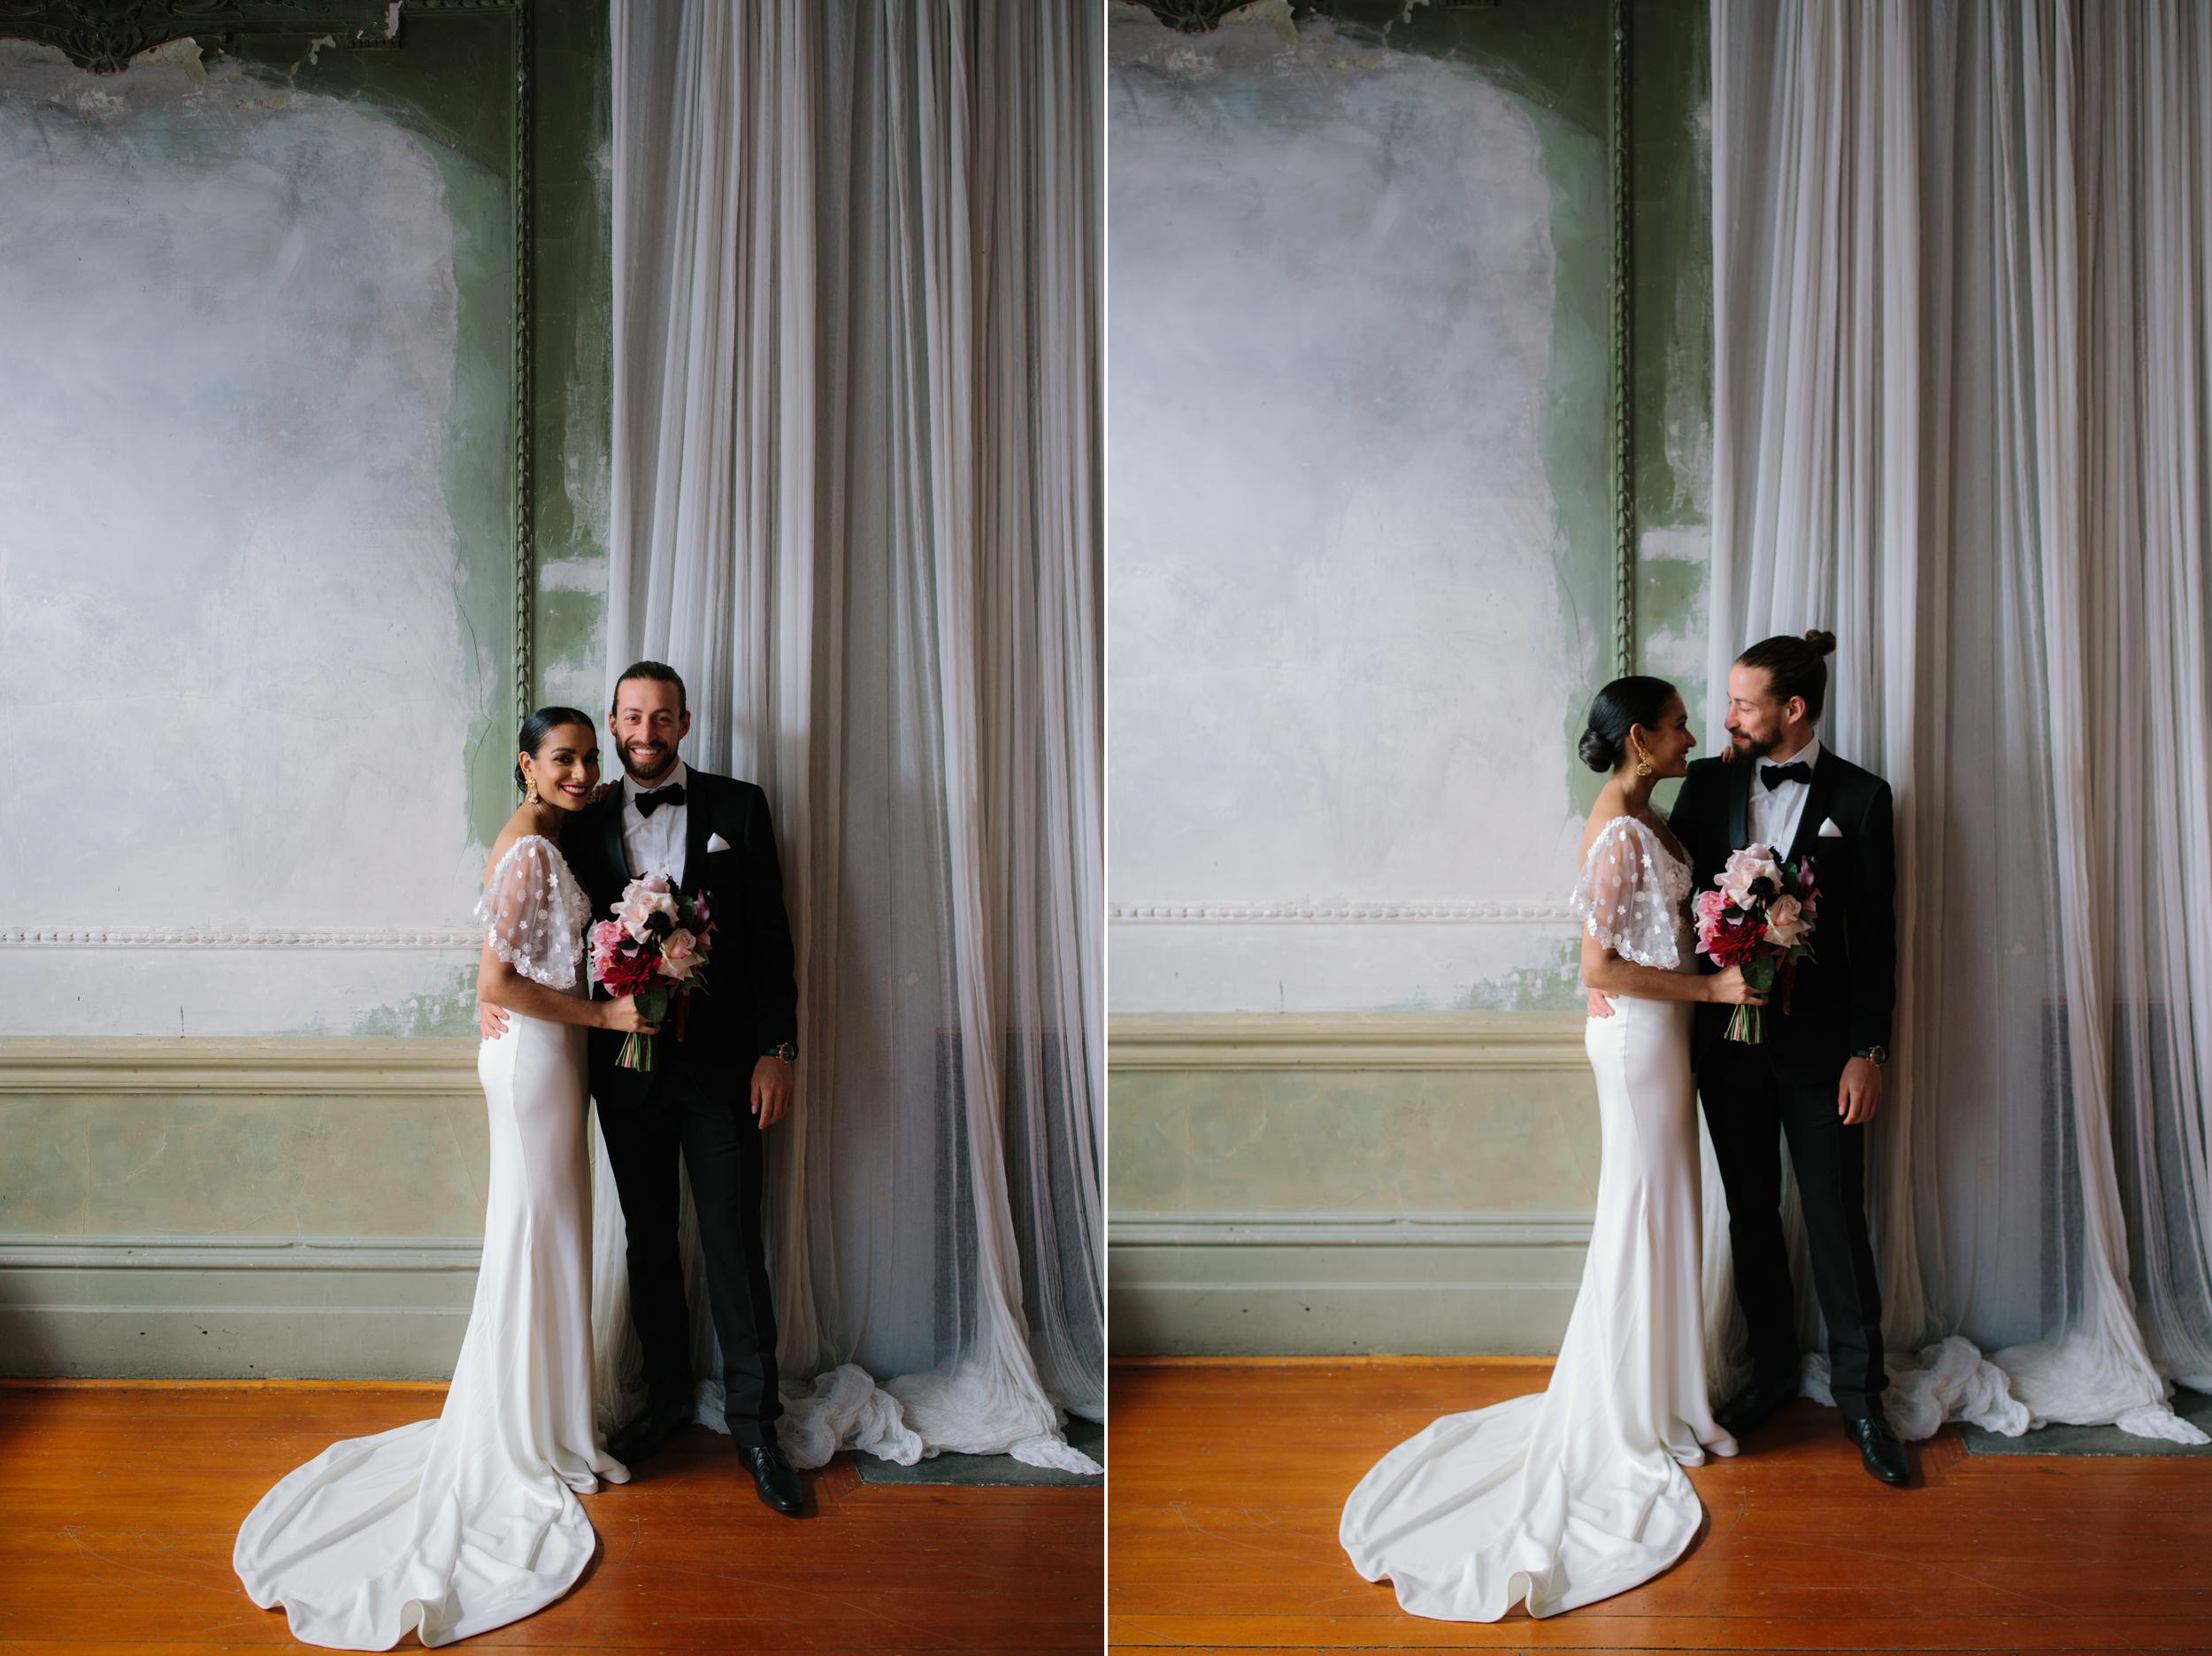 I-Got-You-Babe-Weddings-Tevany-Adam0048.JPG